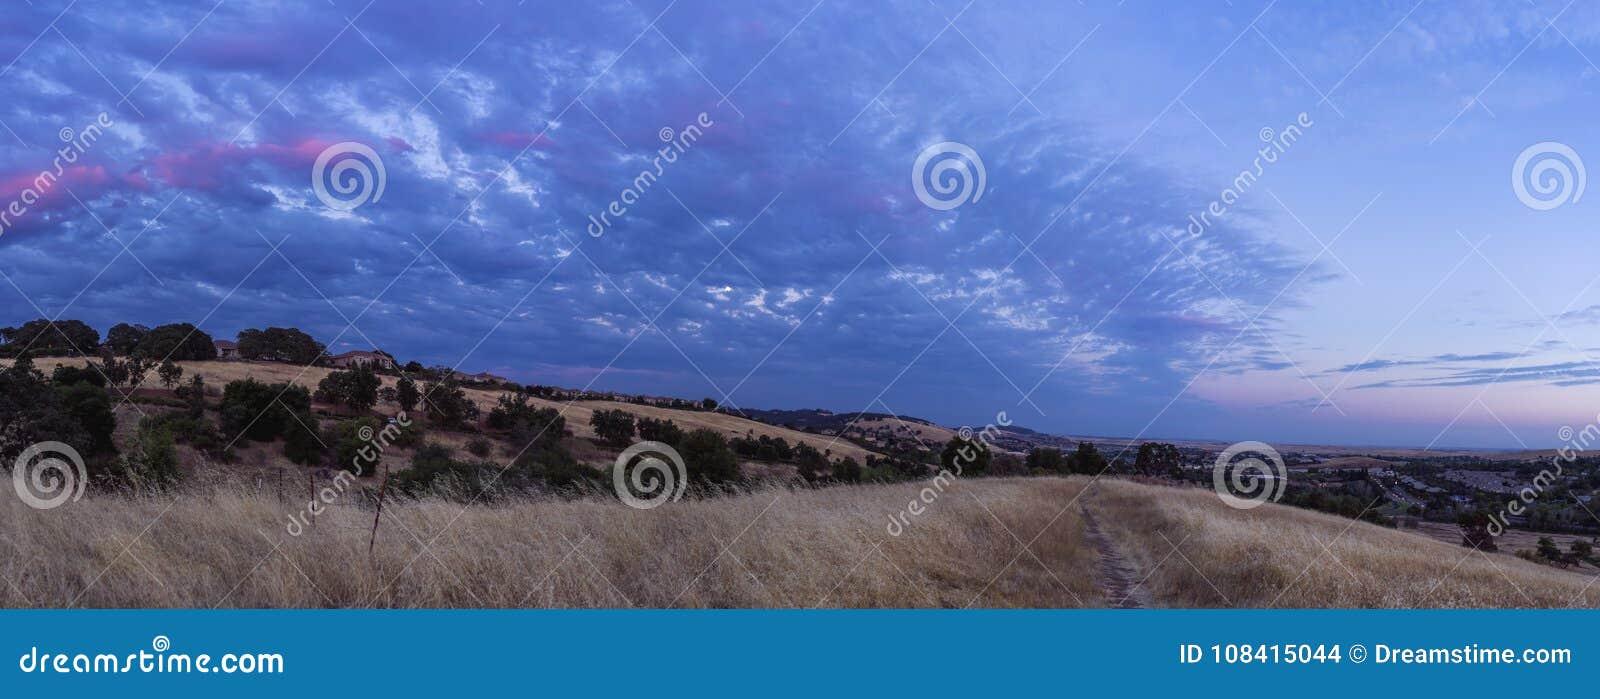 El Dorado Hills Blue Sunset Panorama